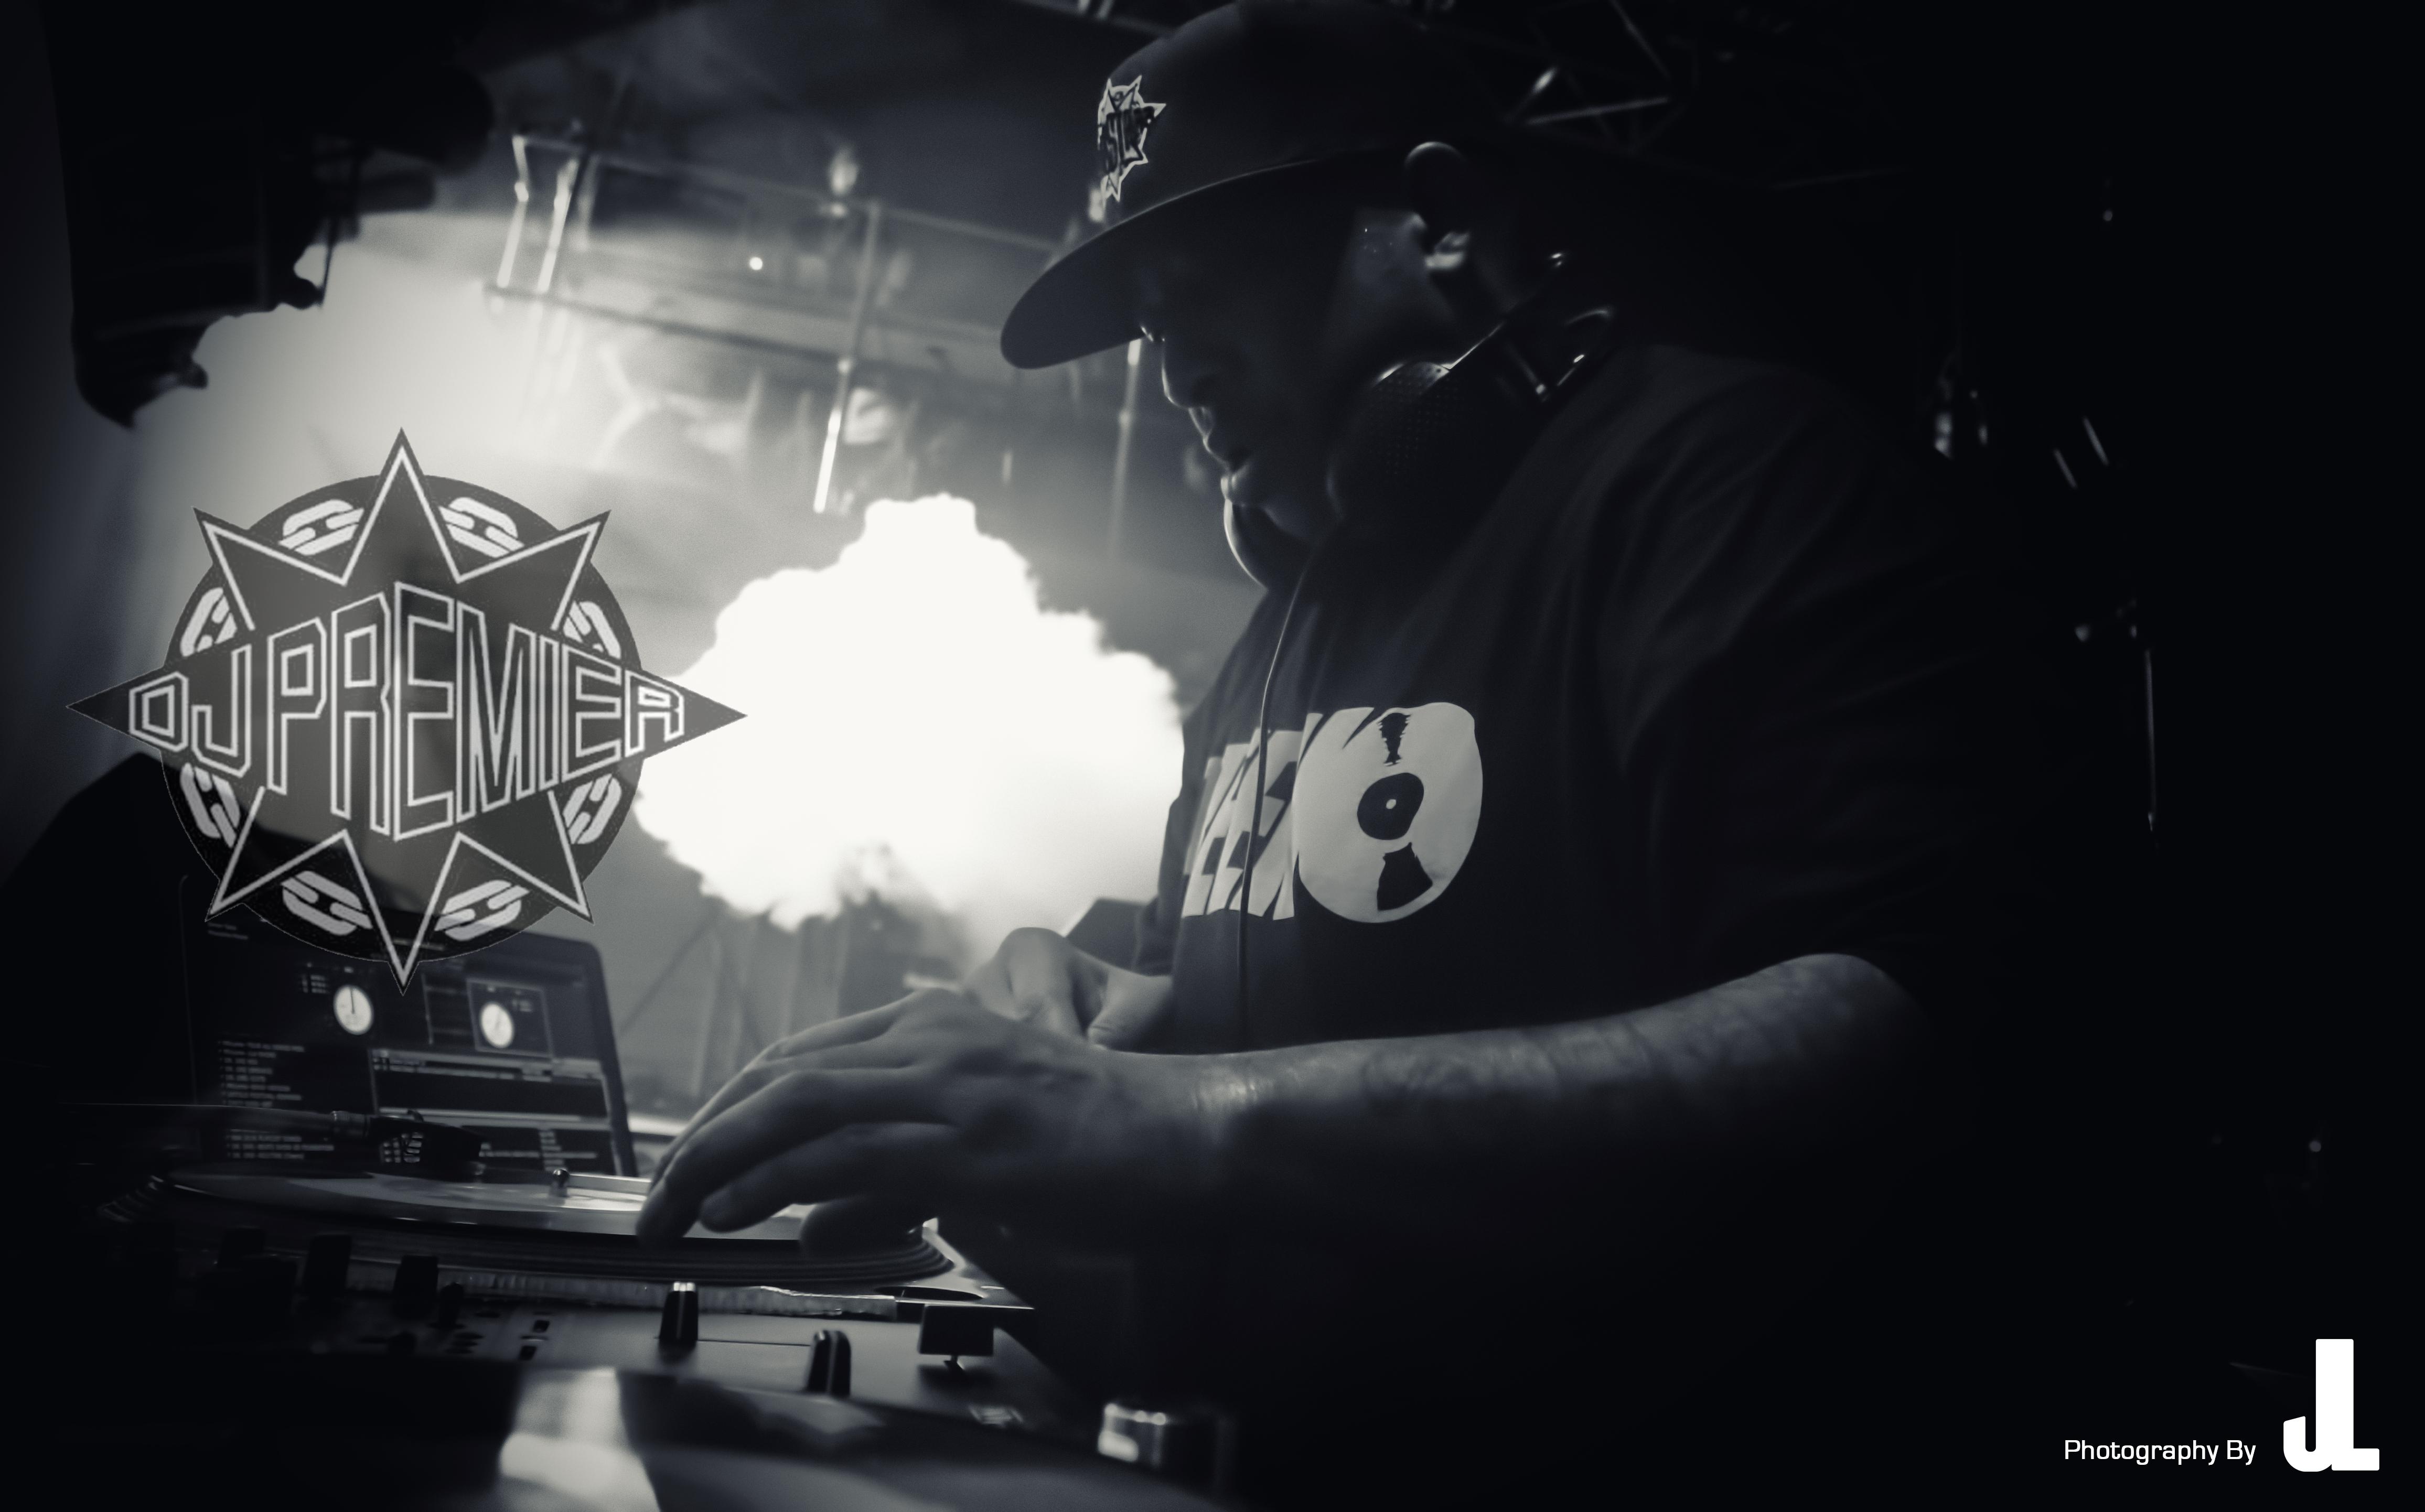 DJ Premier